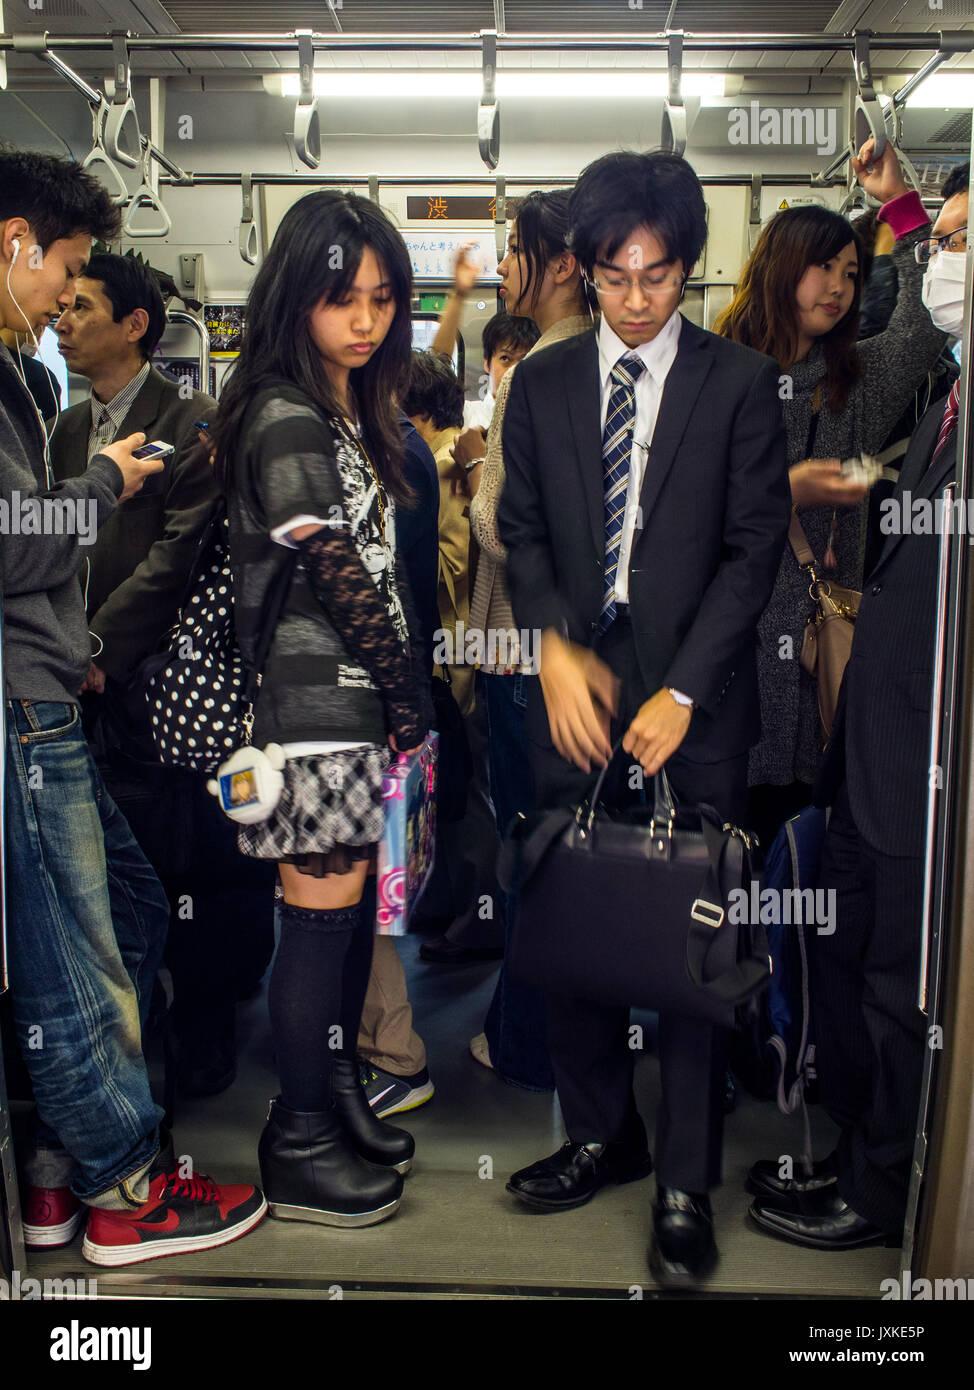 Train de banlieue bondé, la gare de Shinjuku, Toko, Japon Photo Stock